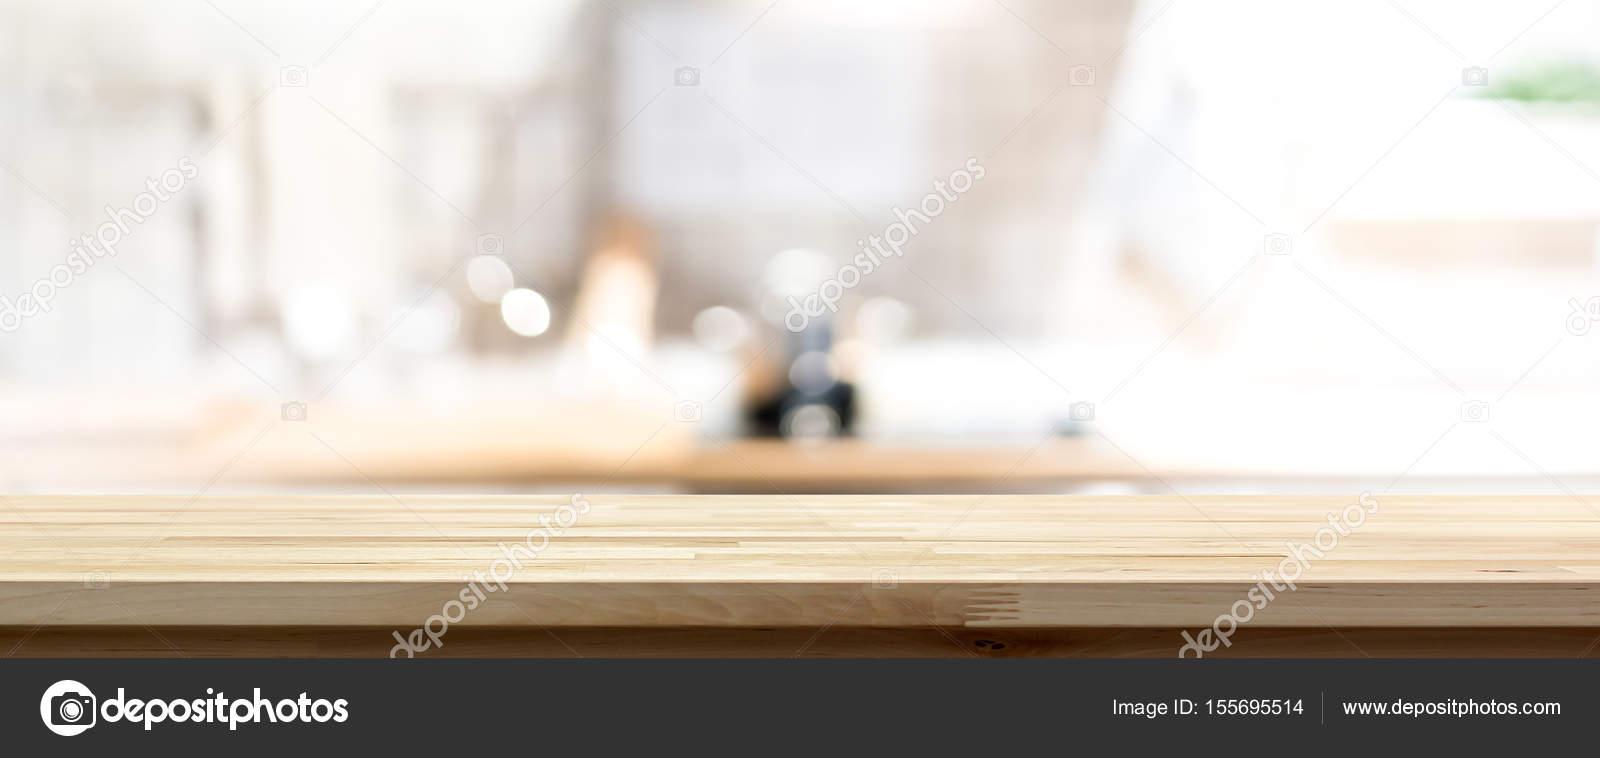 Holz Arbeitsplatte Oder Kochinsel Auf Unscharfe Kuche Interieur